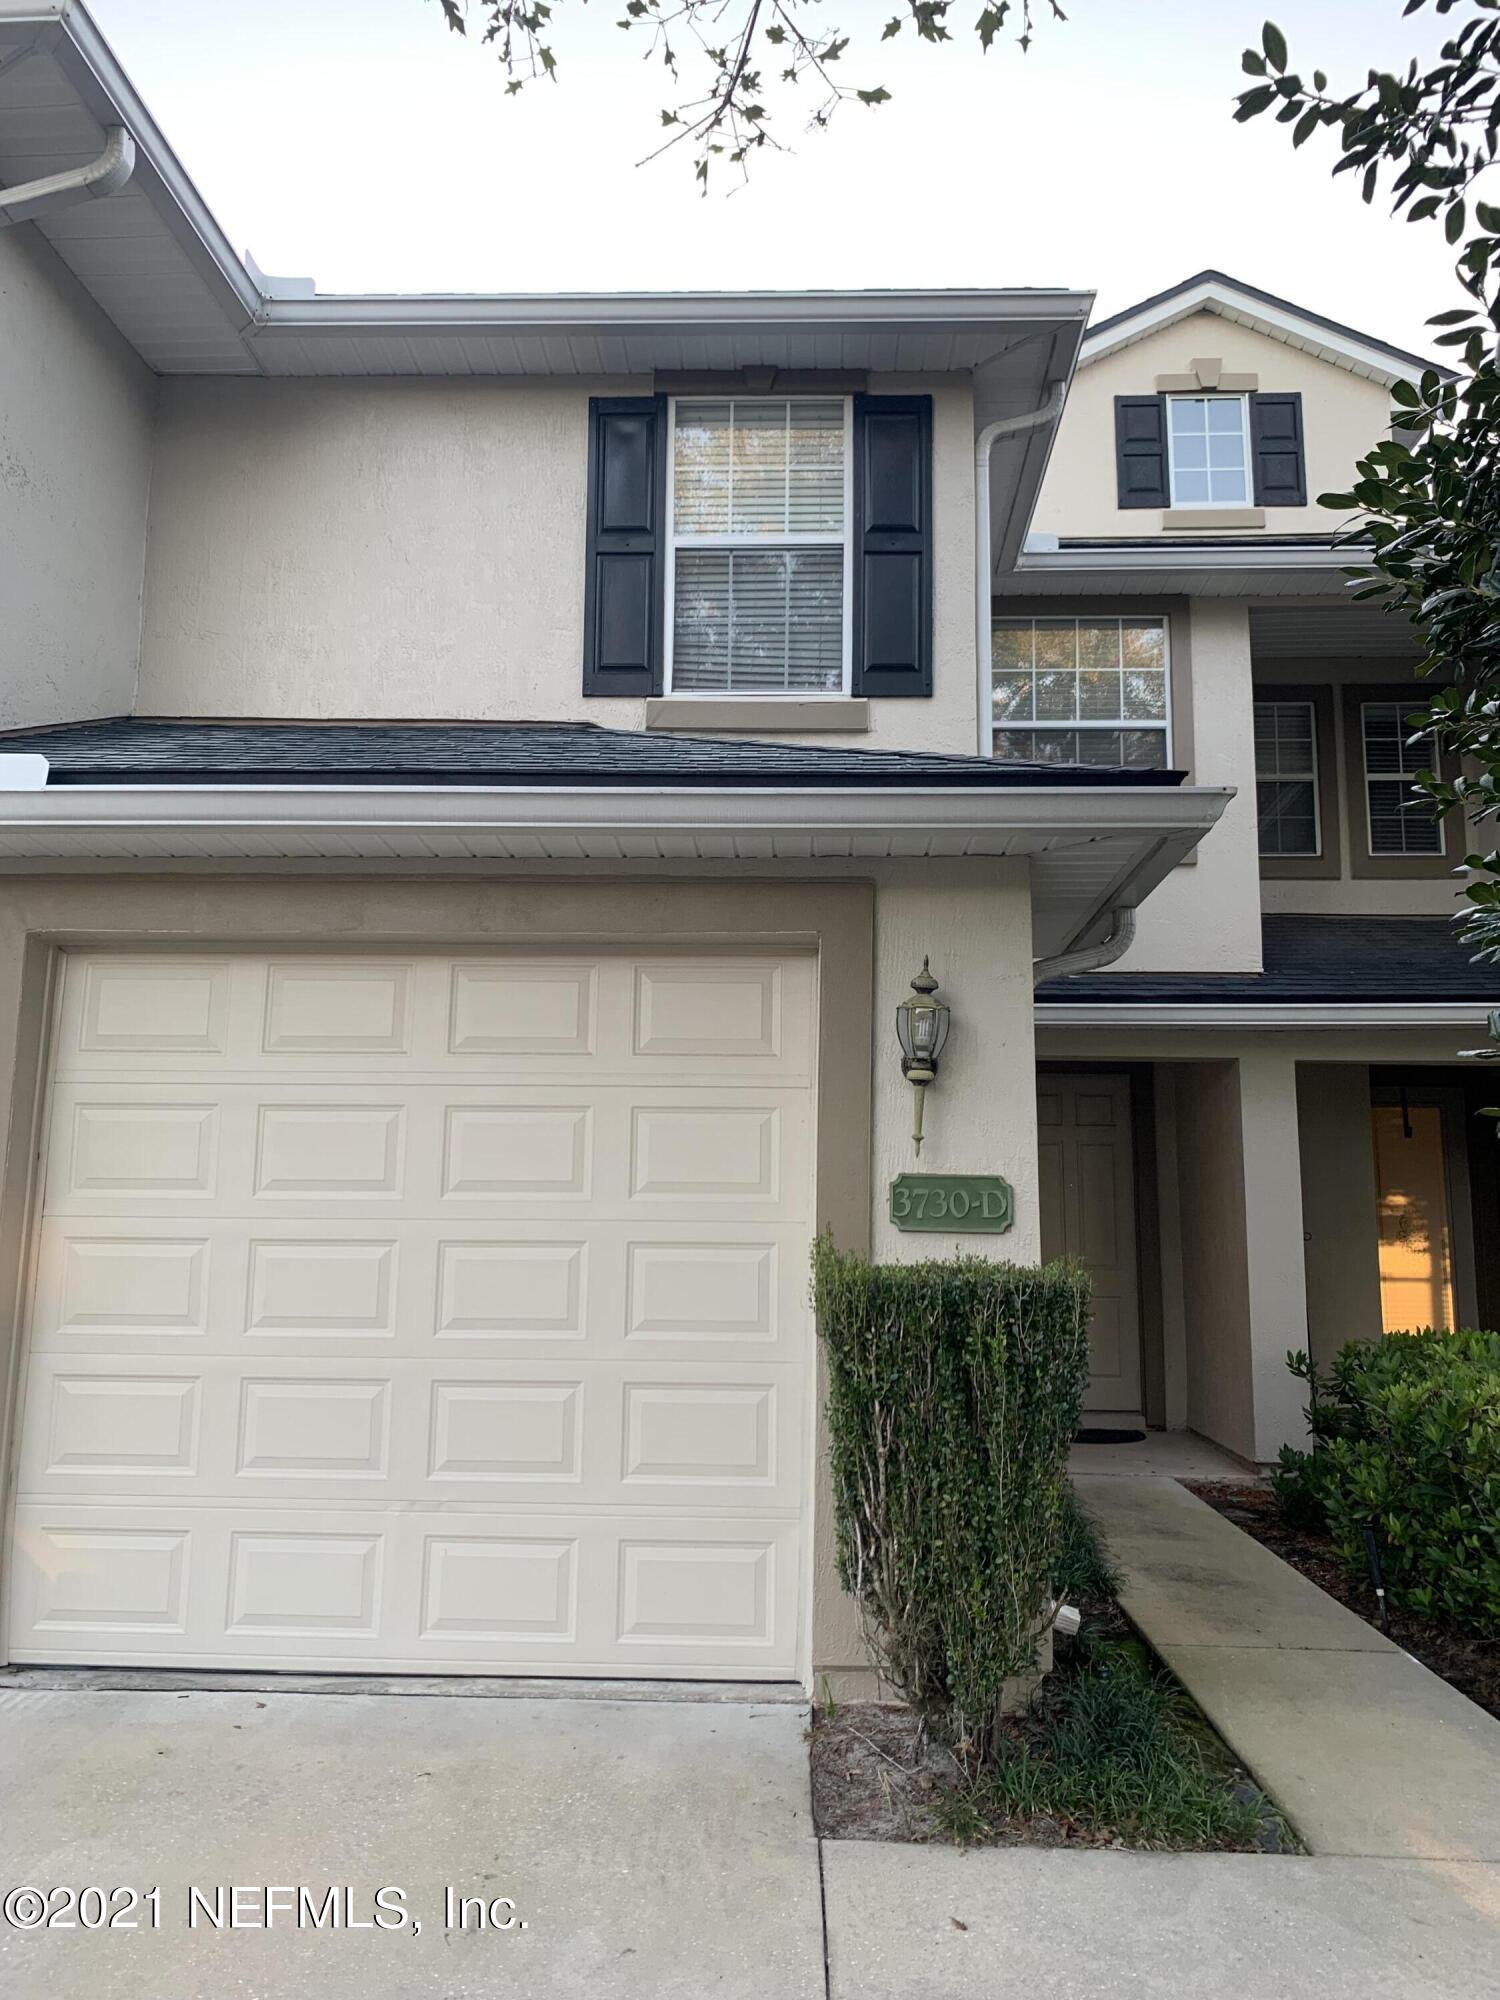 3730 CRESWICK, ORANGE PARK, FLORIDA 32065, 3 Bedrooms Bedrooms, ,2 BathroomsBathrooms,Residential,For sale,CRESWICK,1100146